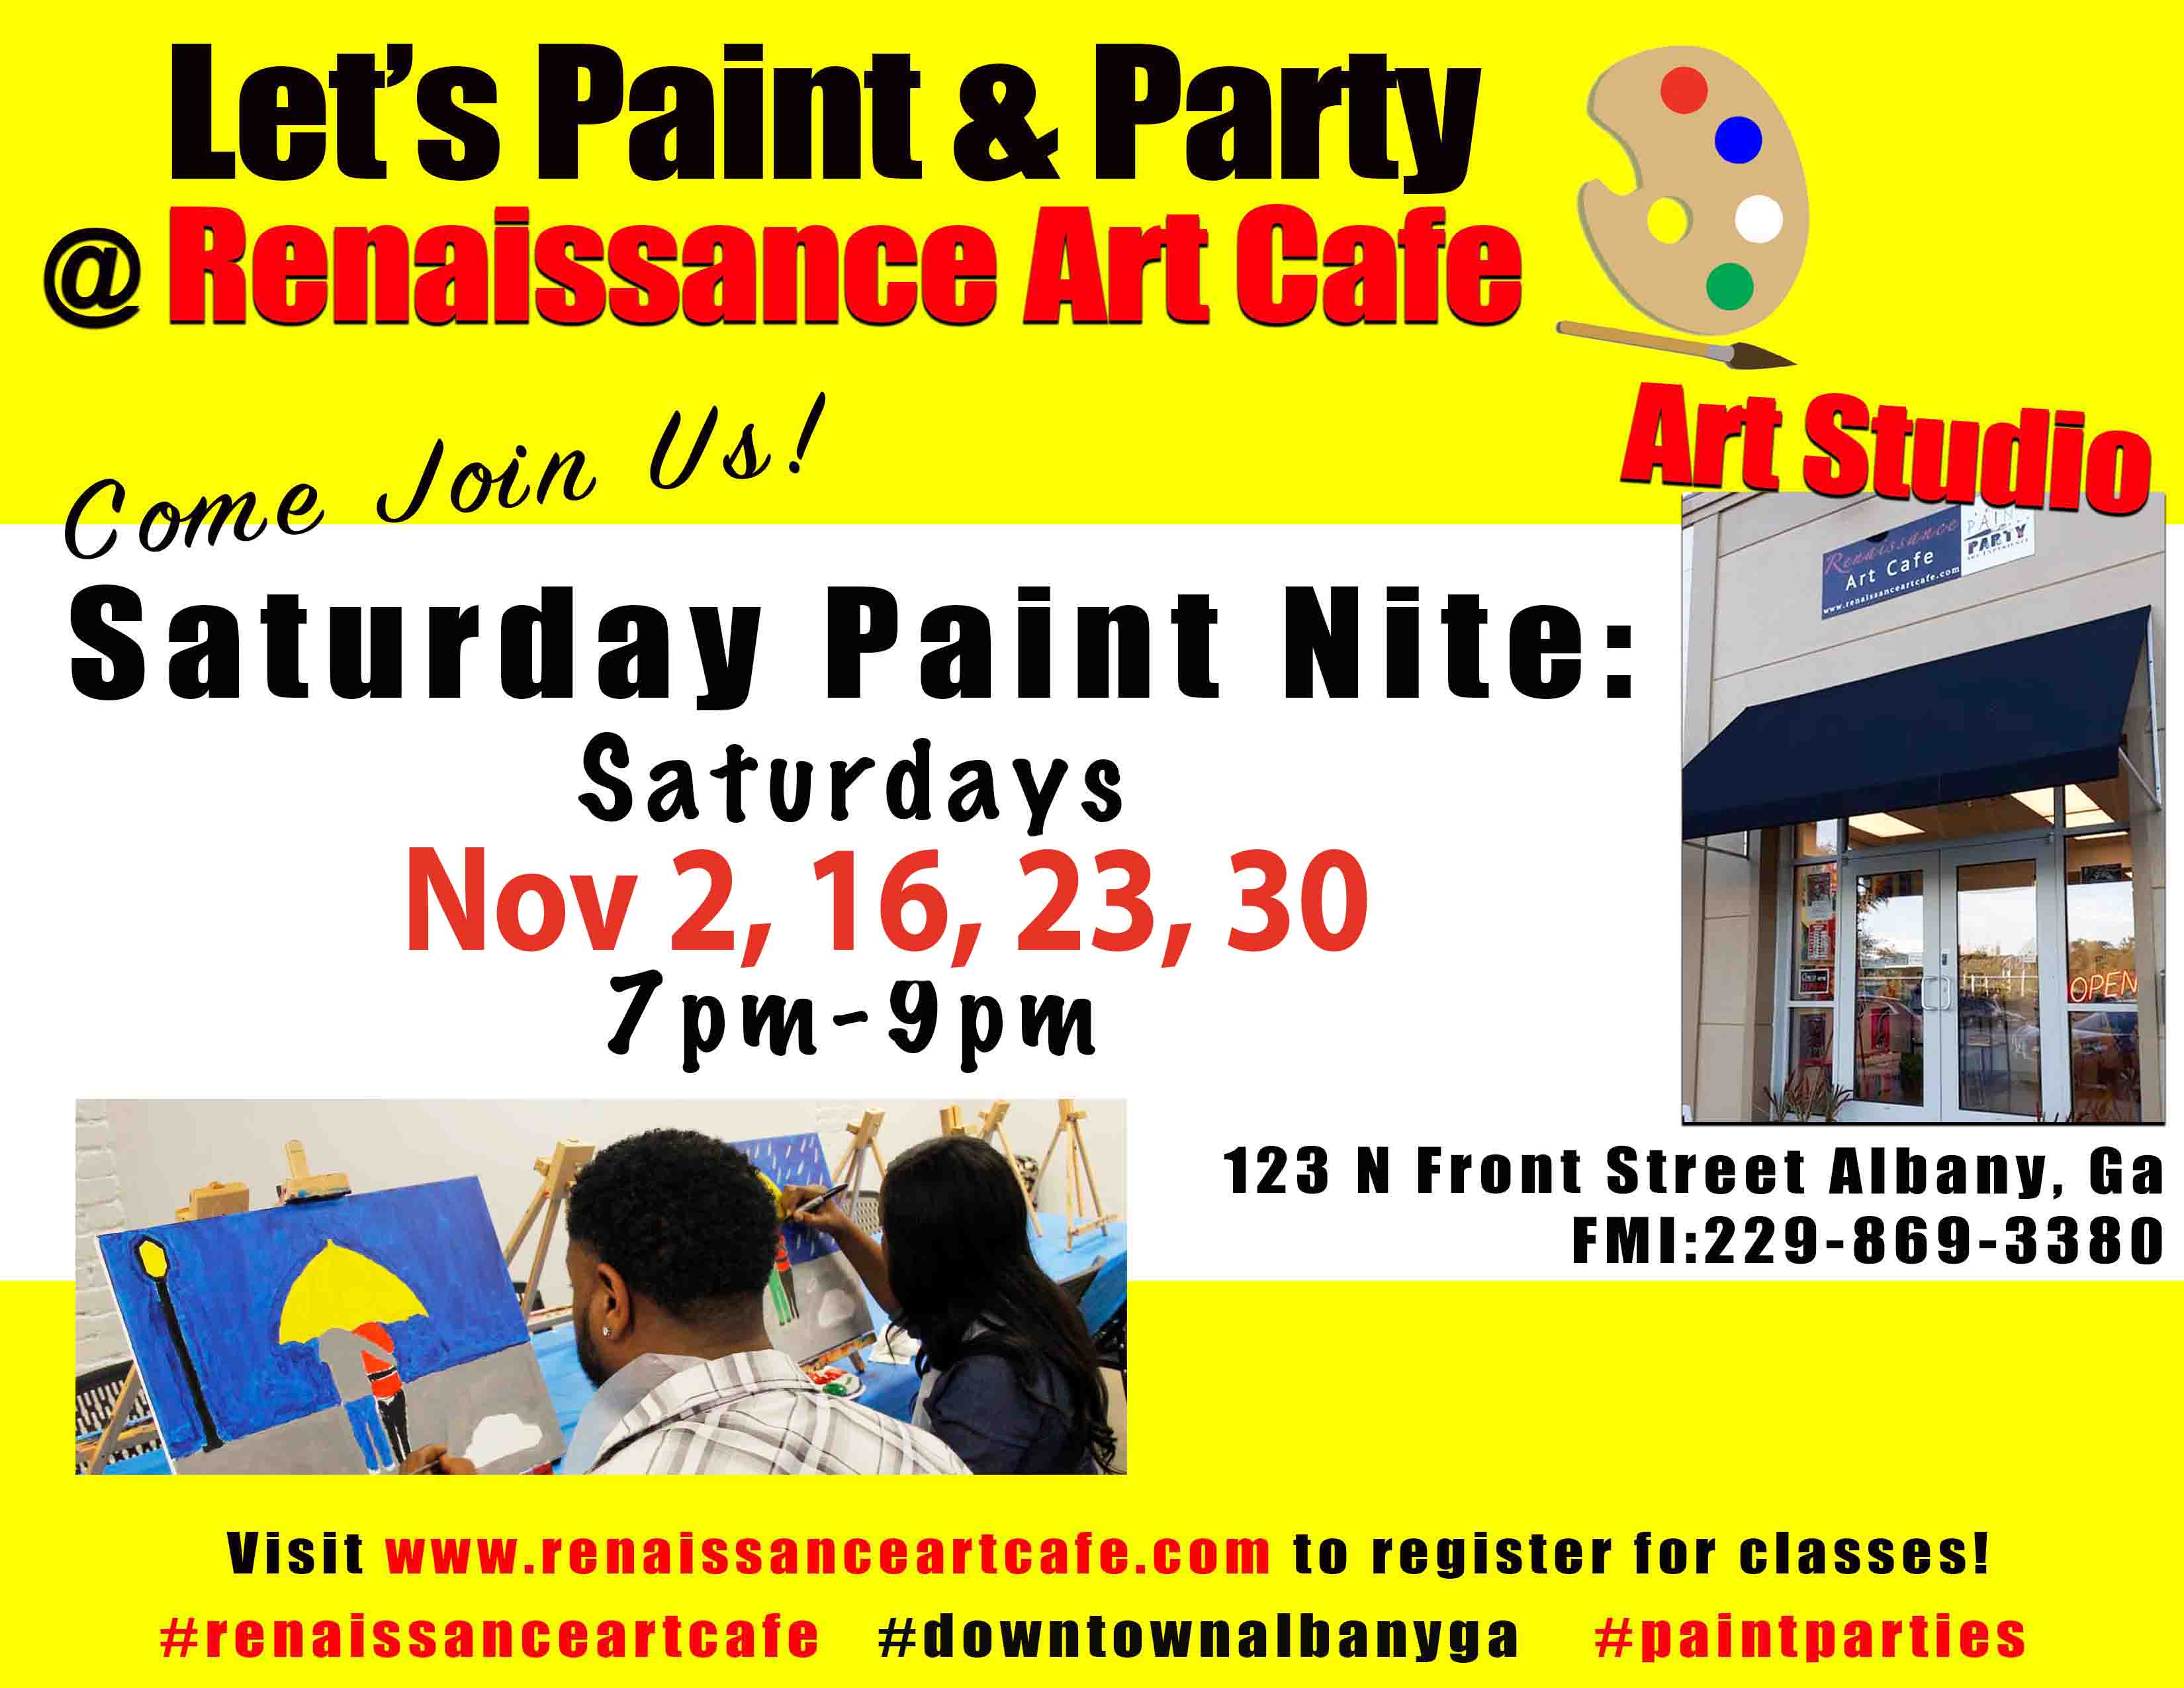 Saturday Paint Nite